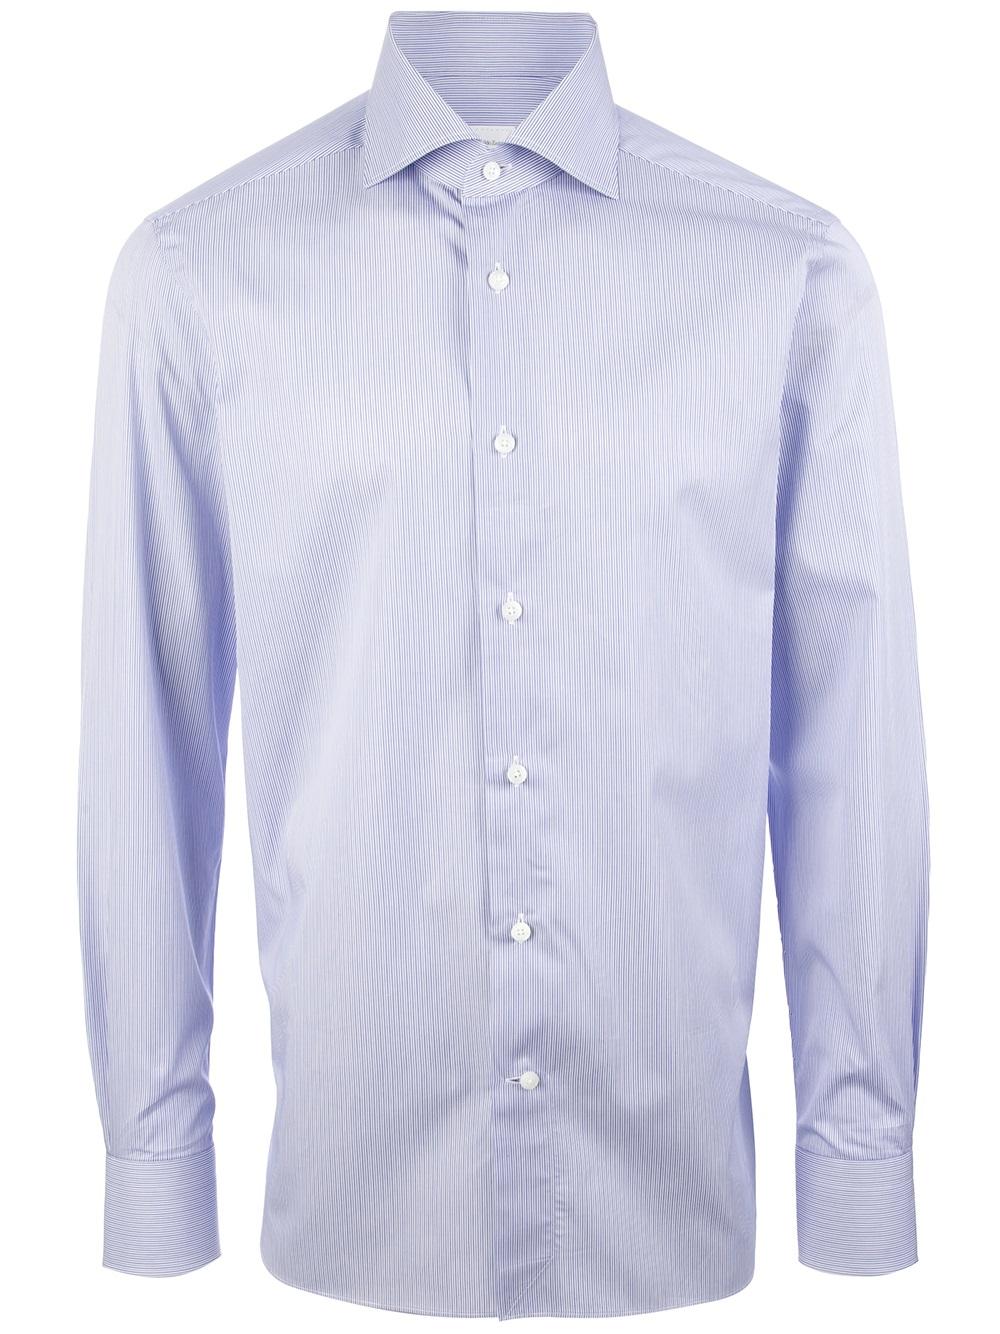 ermenegildo zegna fine striped shirt in blue for men lyst. Black Bedroom Furniture Sets. Home Design Ideas